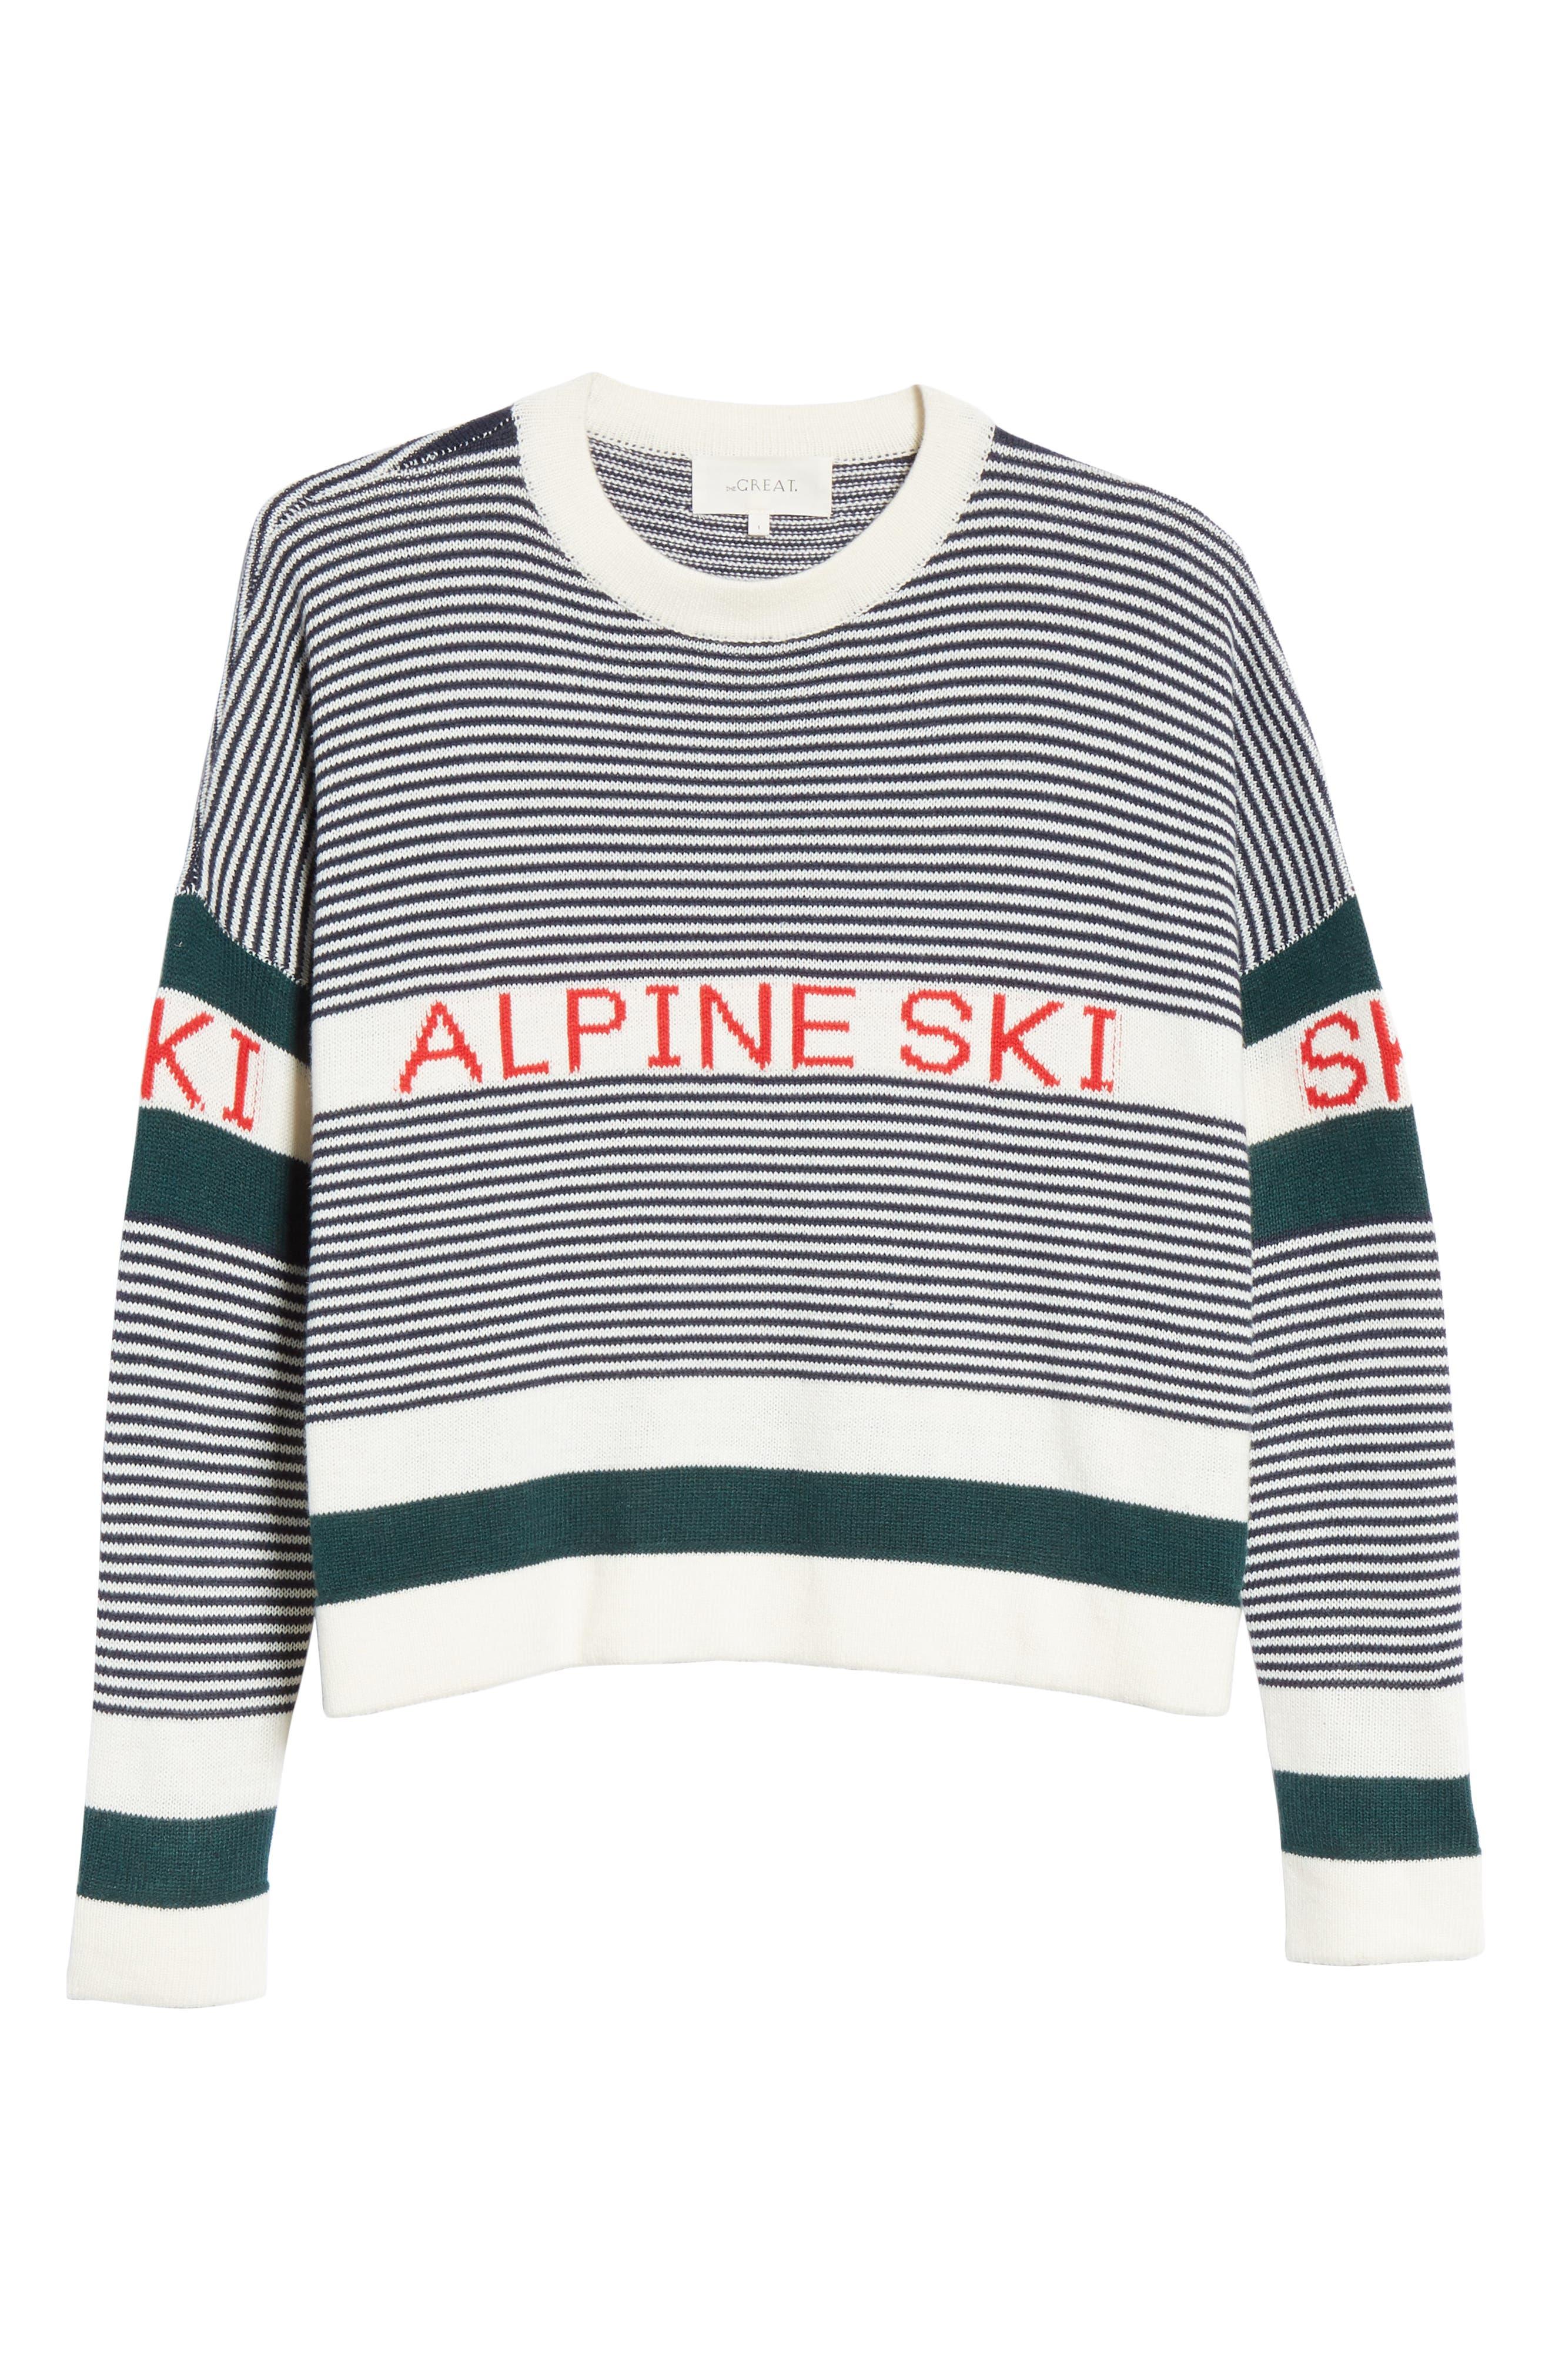 Alpine Ski Sweater,                             Alternate thumbnail 6, color,                             900